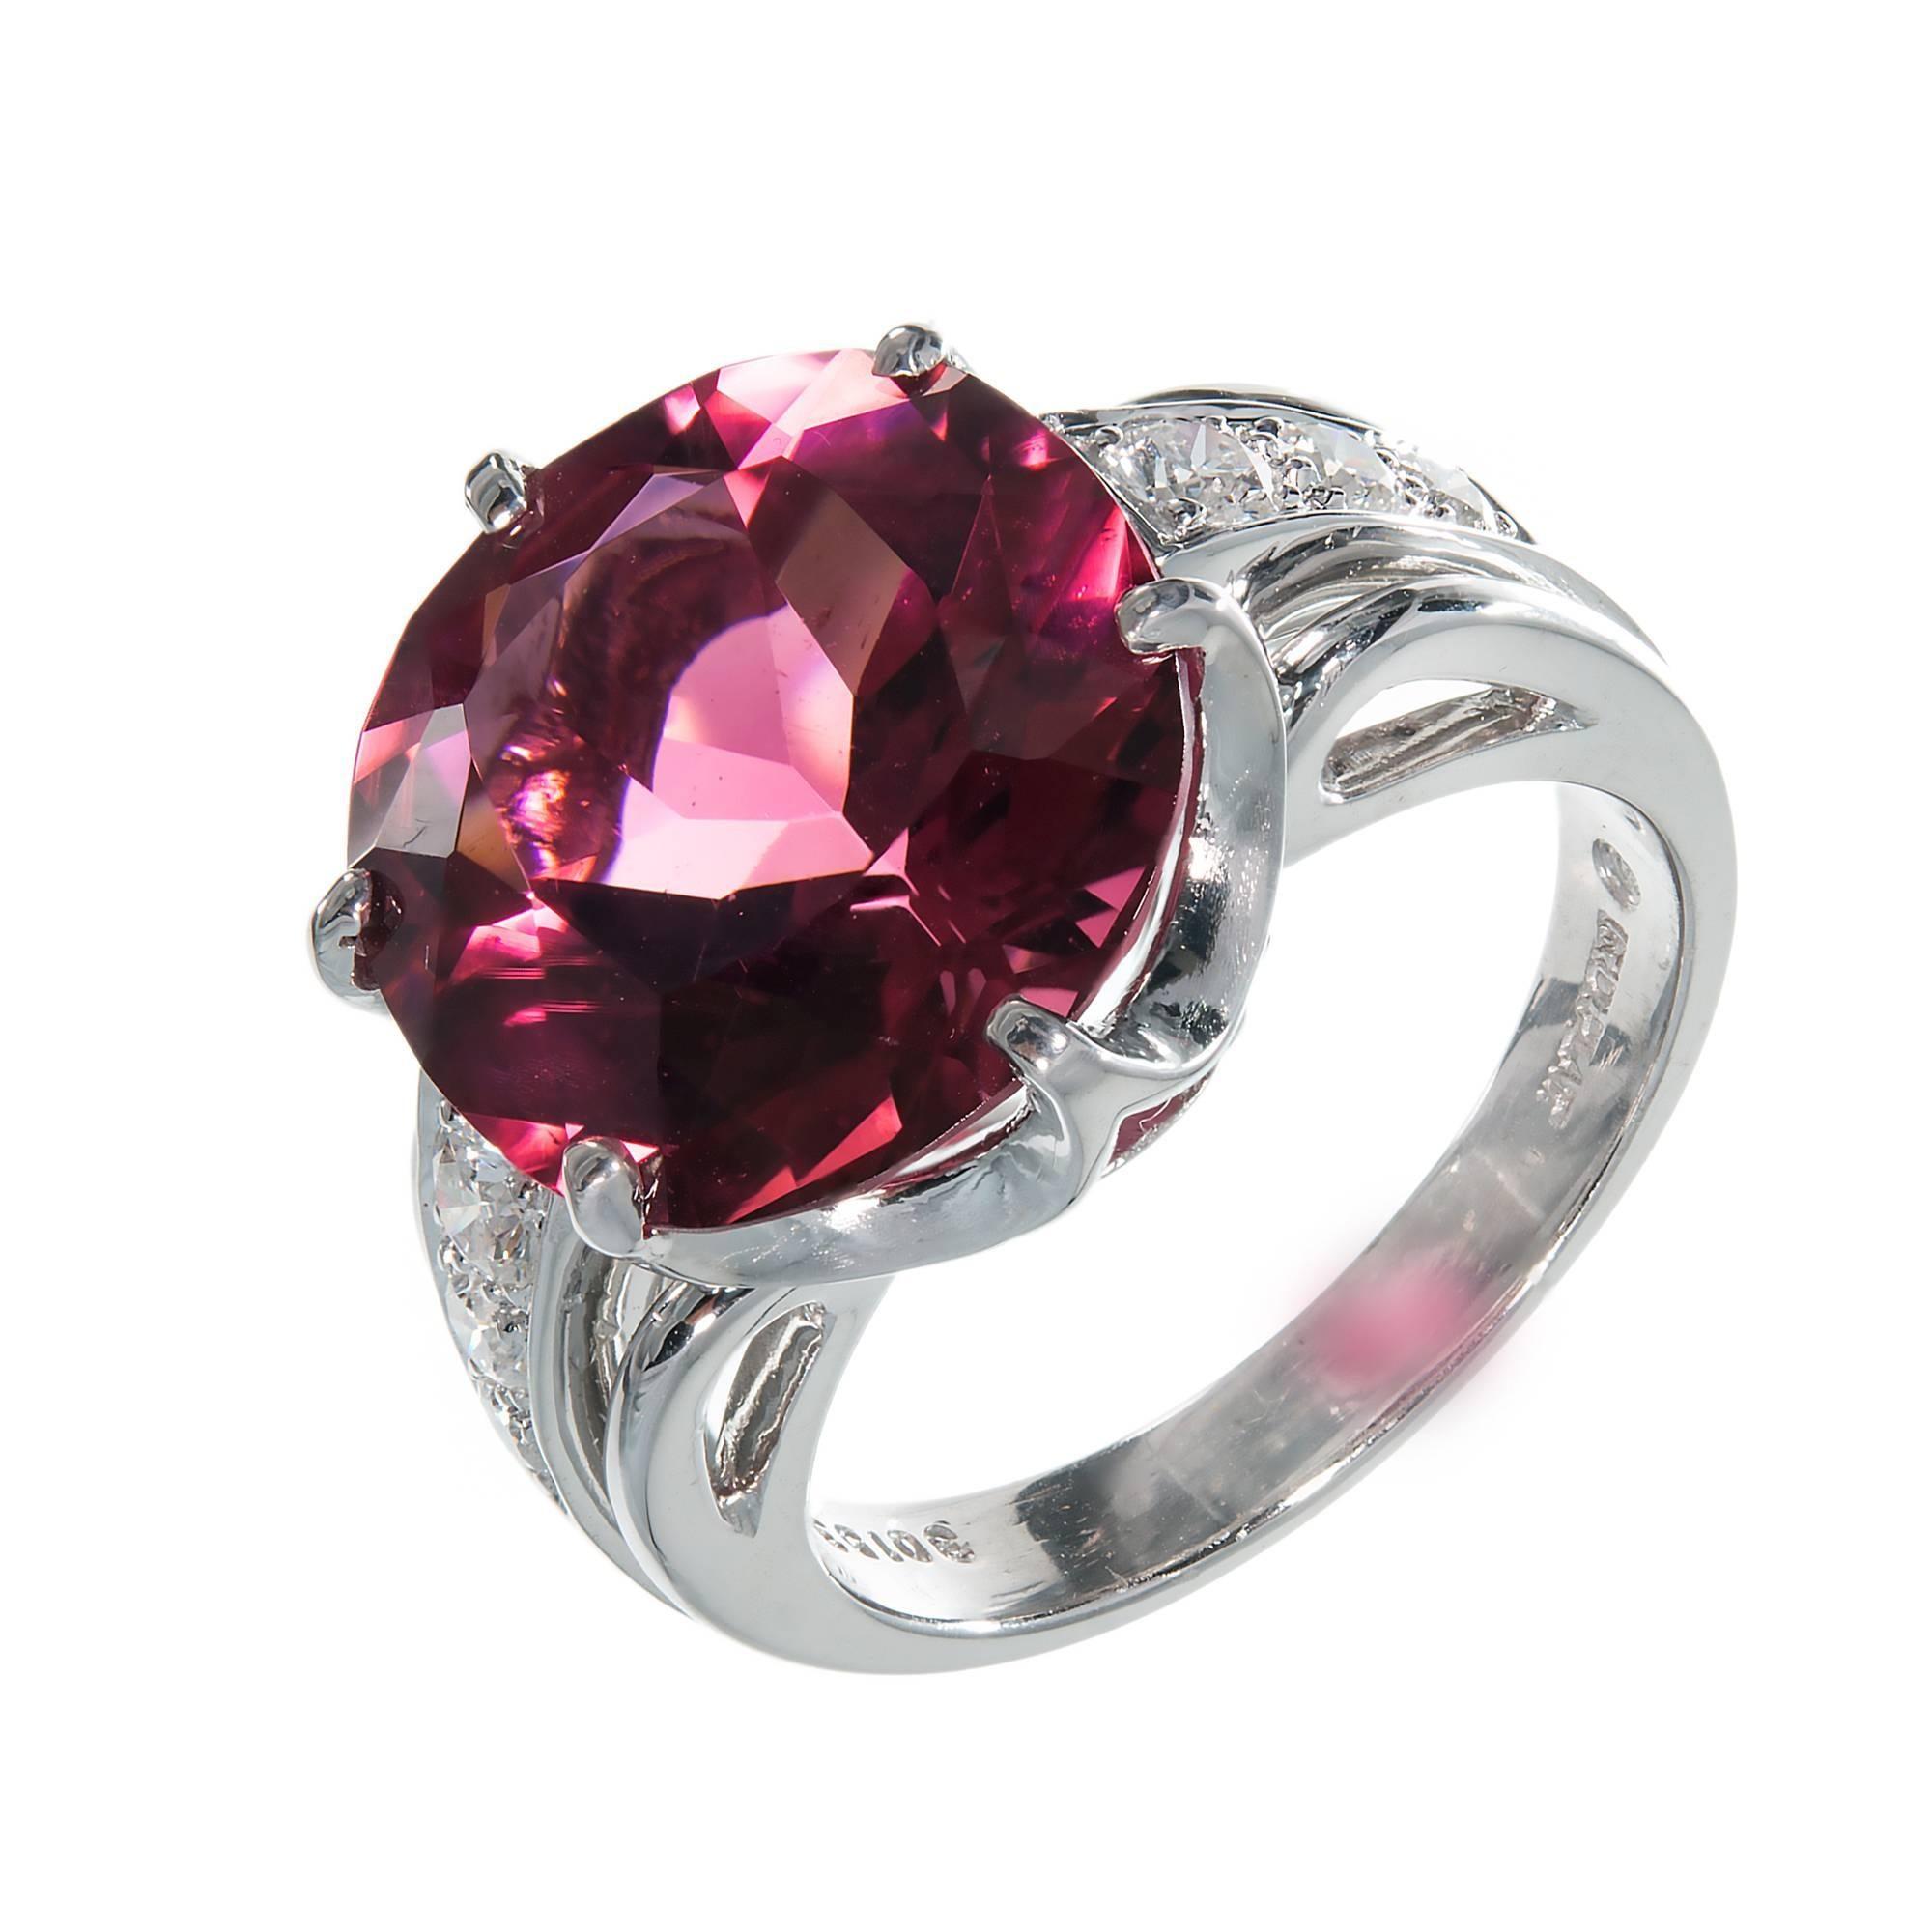 8.14 Carat Round Pink Rubelite Tourmaline Diamond Platinum Cocktail Ring